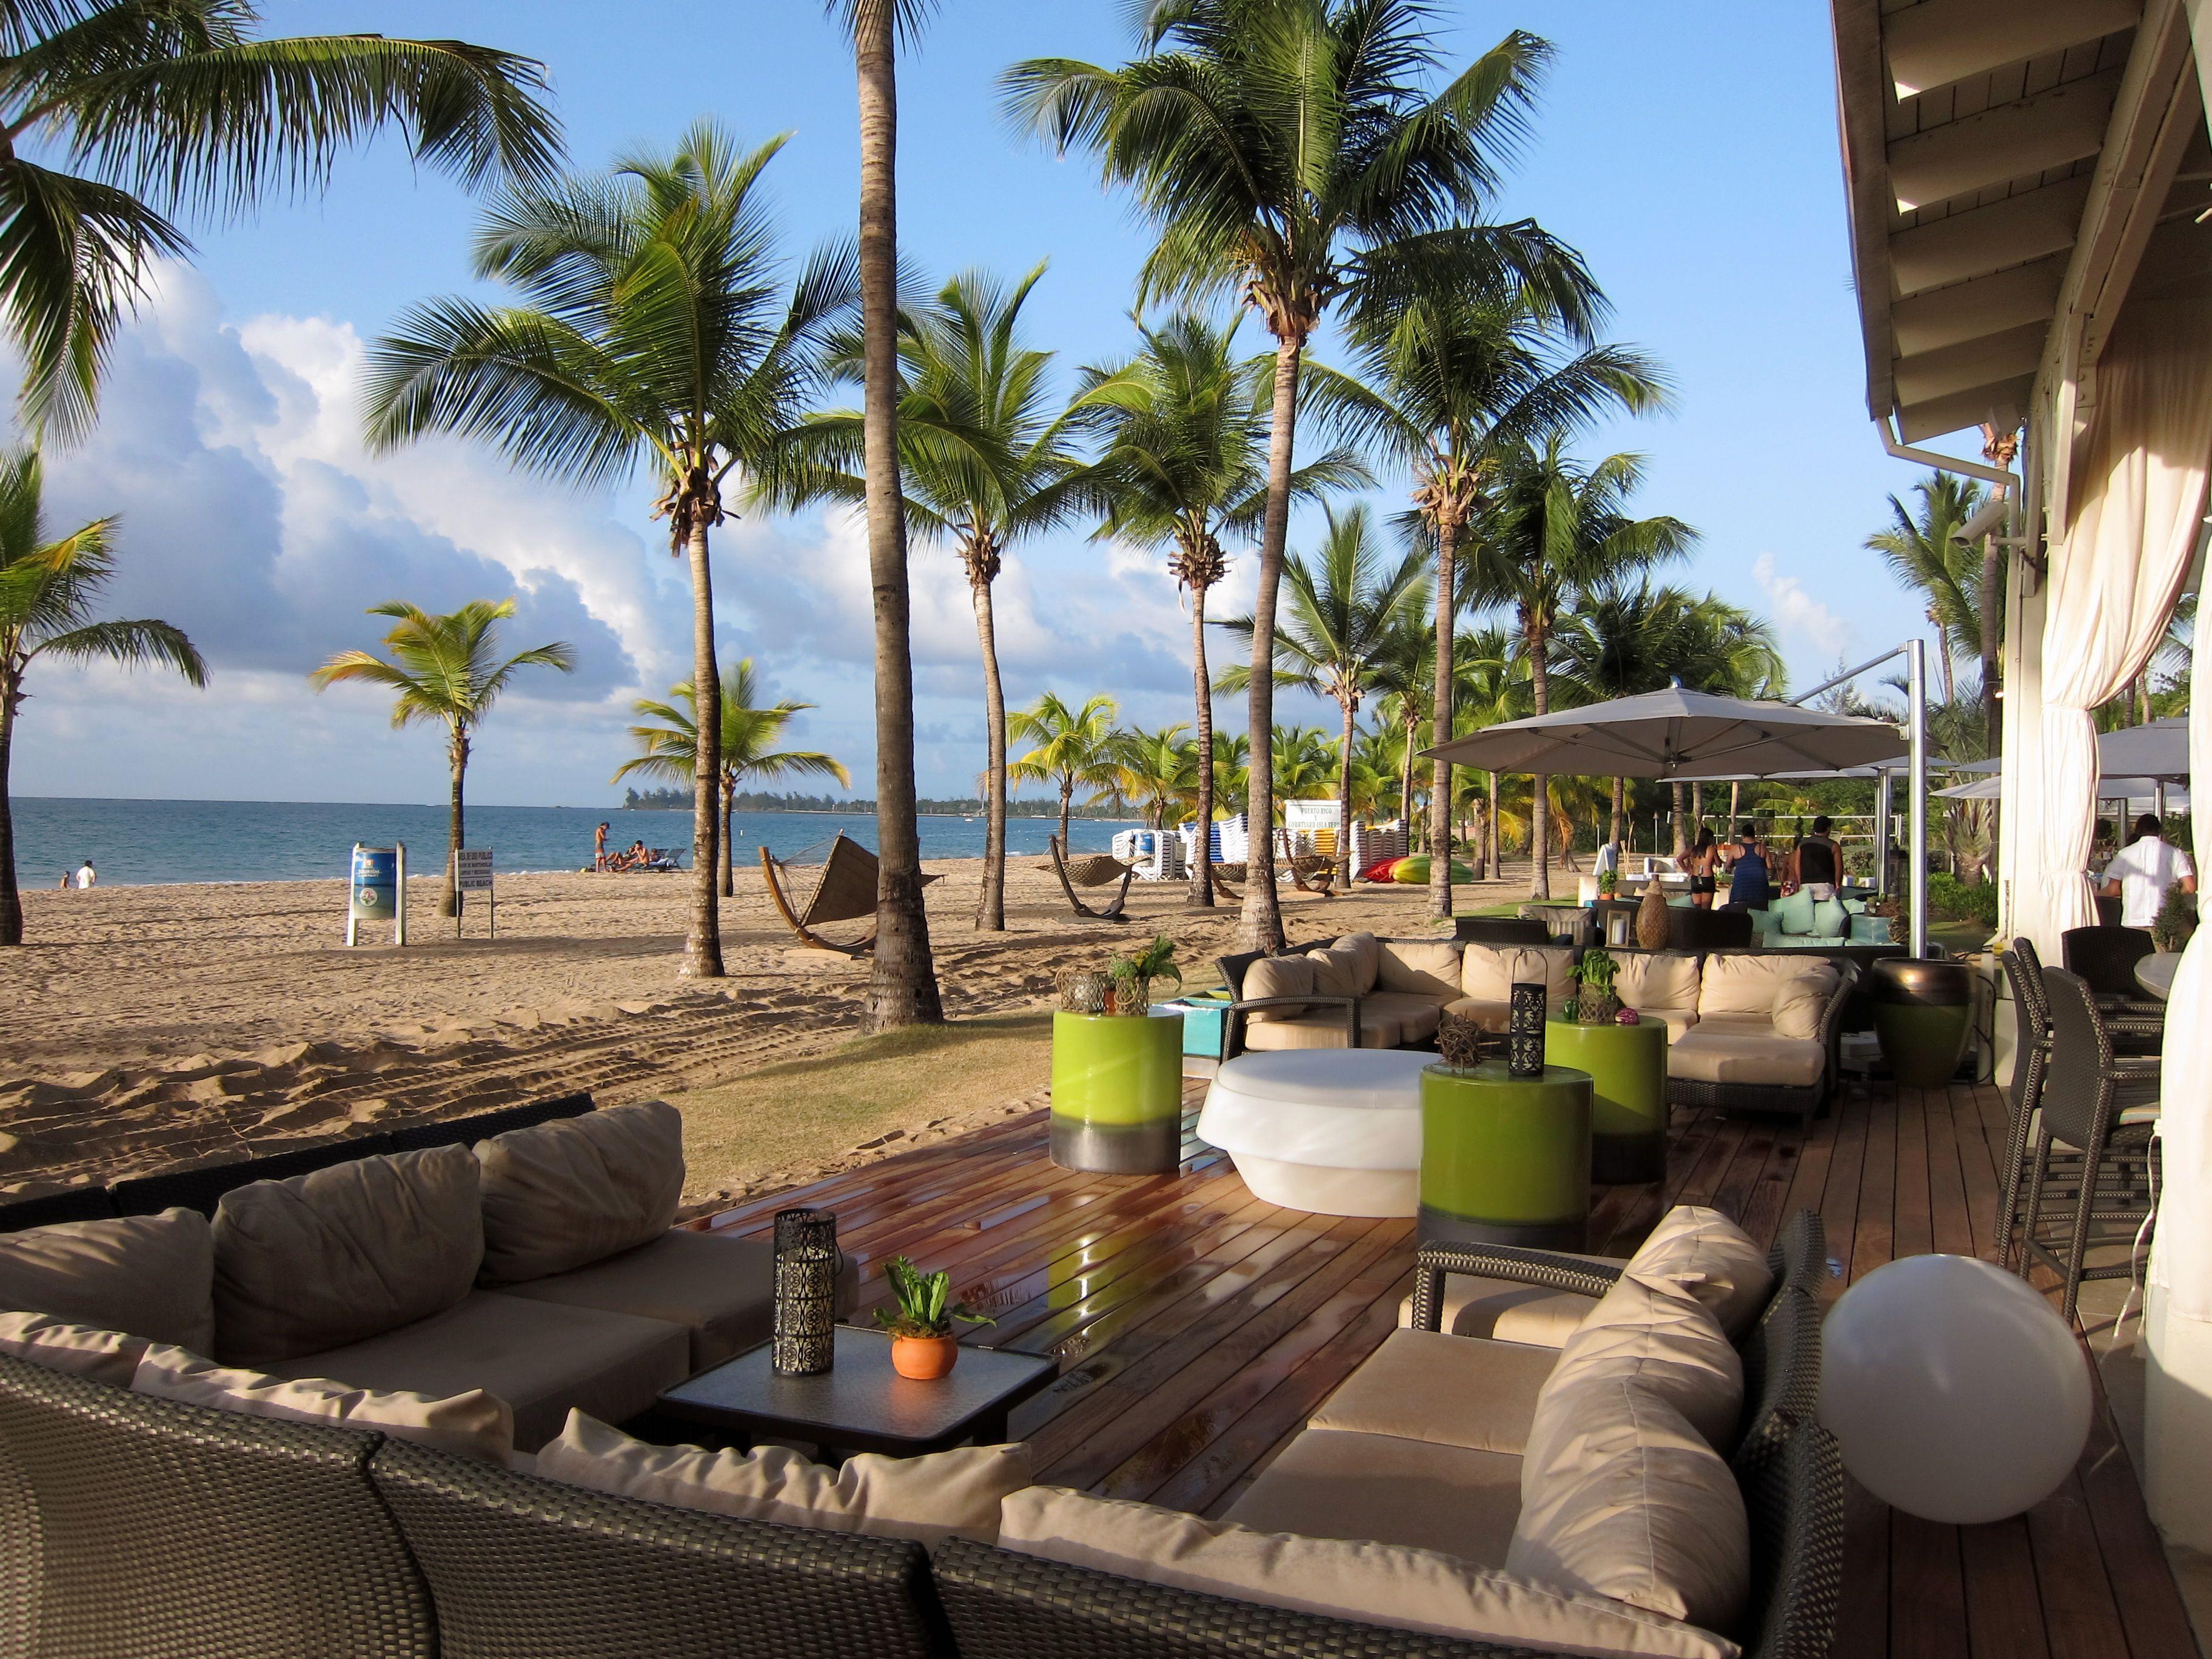 Courtyard Isla Verde Beach Bar Sanjuan Puertorico